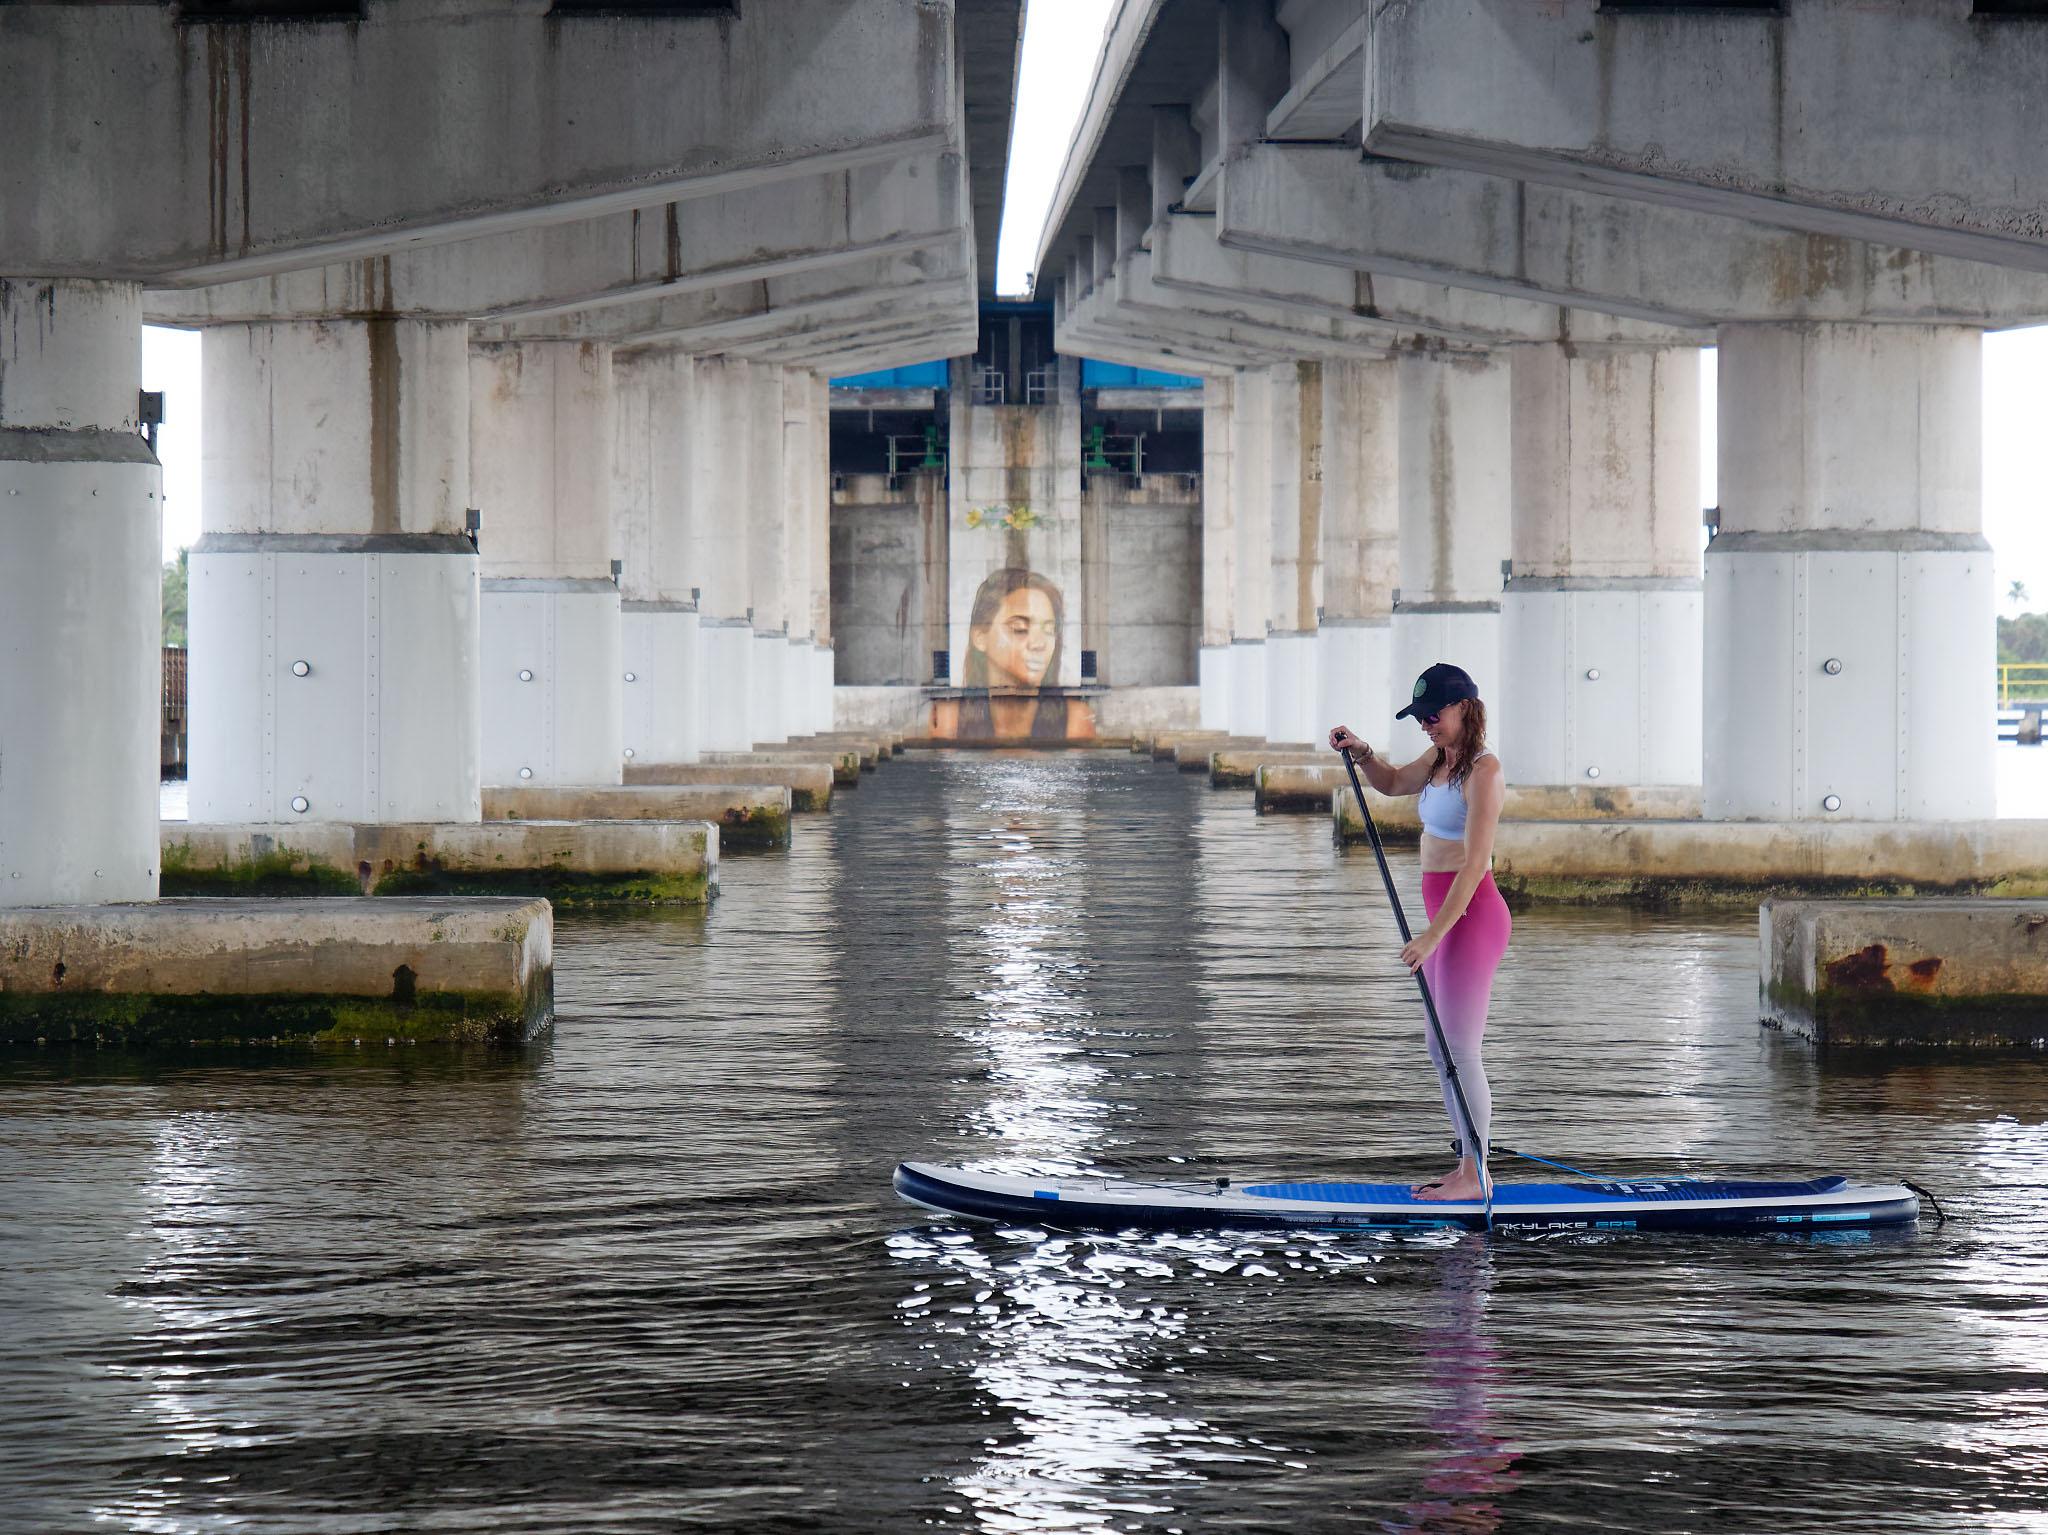 SUP paddling under a bridge